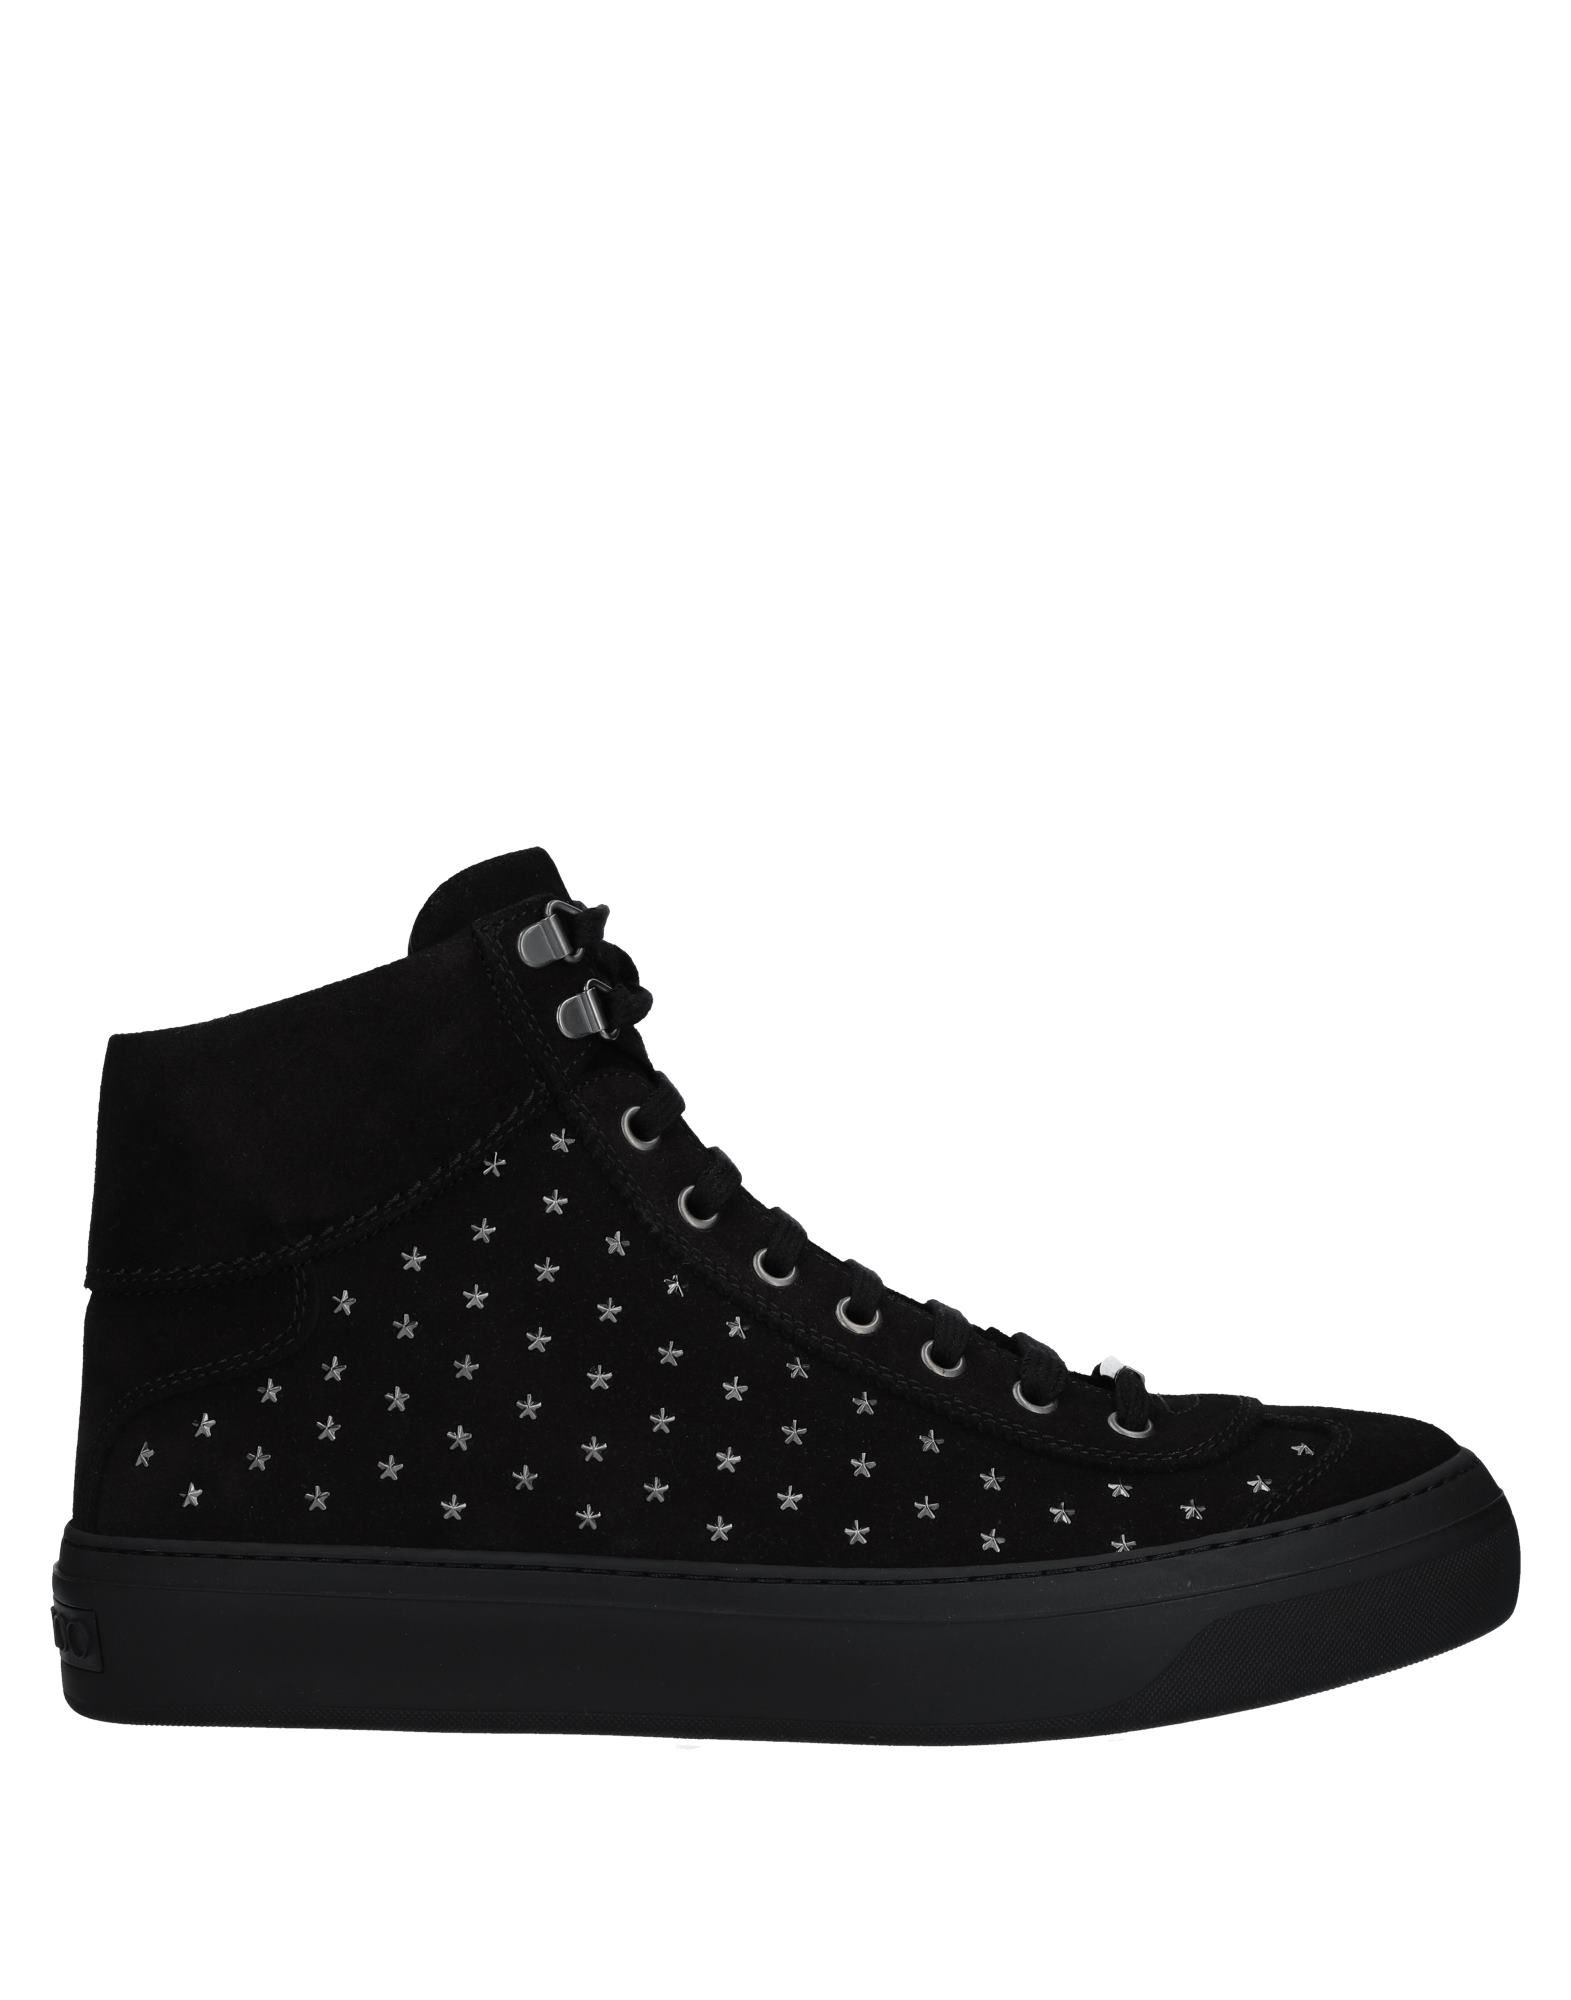 Jimmy Choo Sneakers Herren  11530570DL Gute Qualität beliebte Schuhe